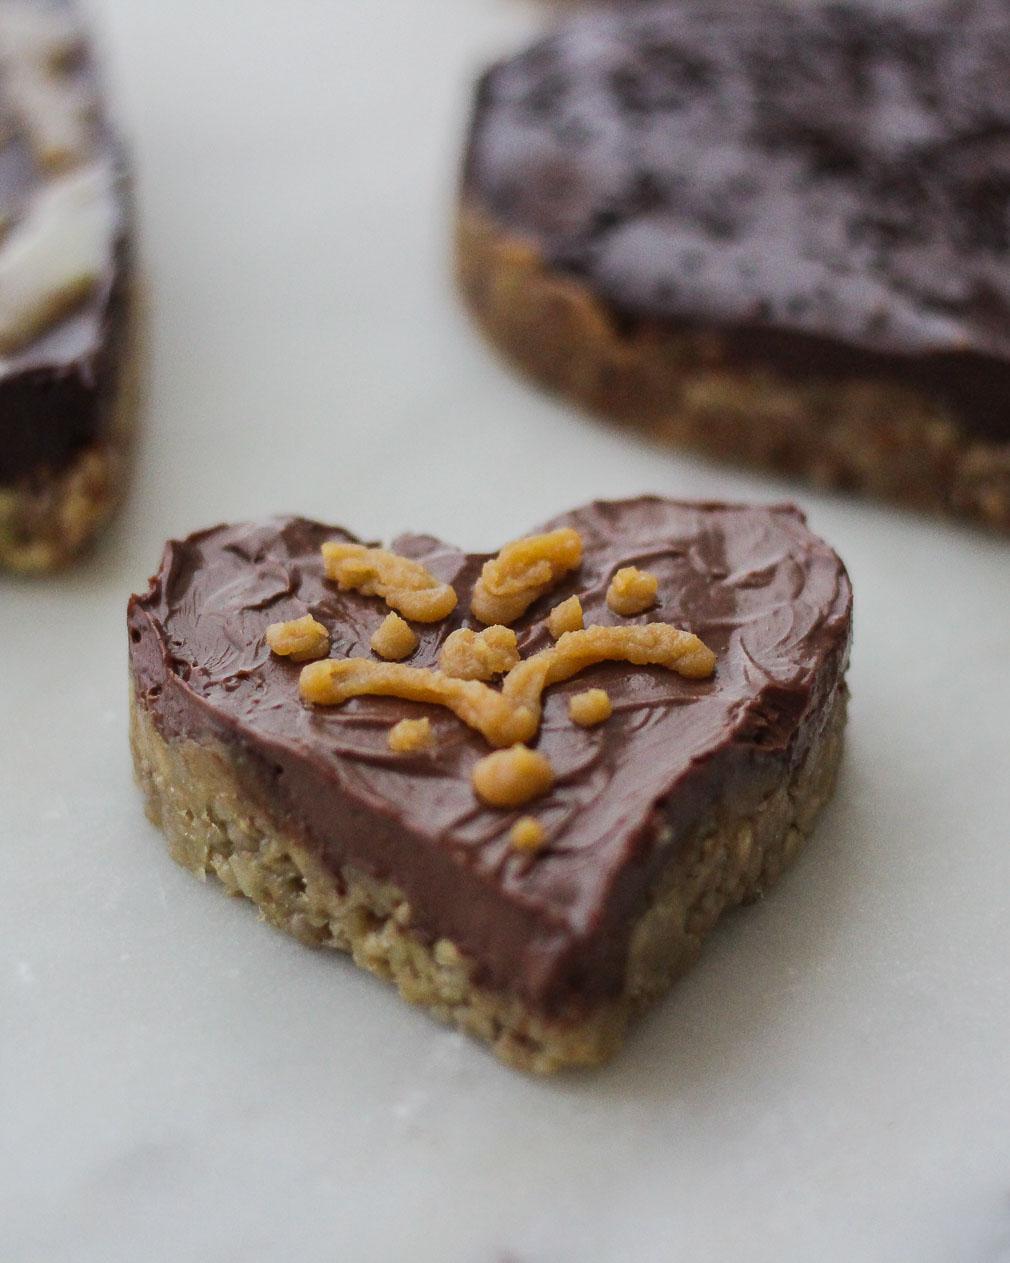 Dark Pecan Tart Paleo, Low-FODMAP and Gluten-free-Perfect for Valentine's Day